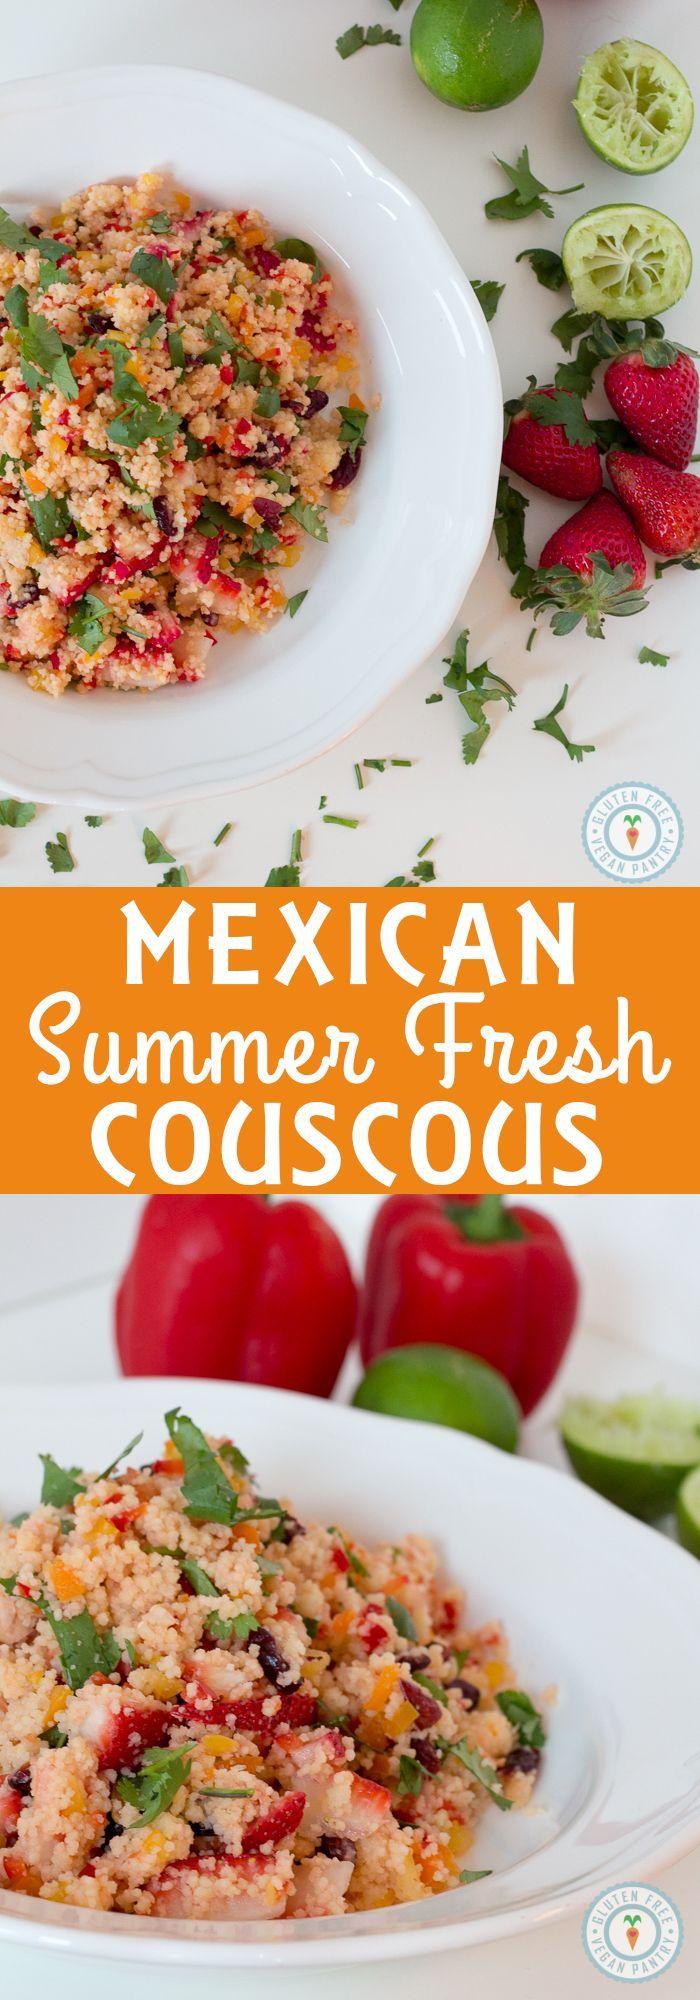 Mexican Summer Fresh Couscous - gluten free and vegan!